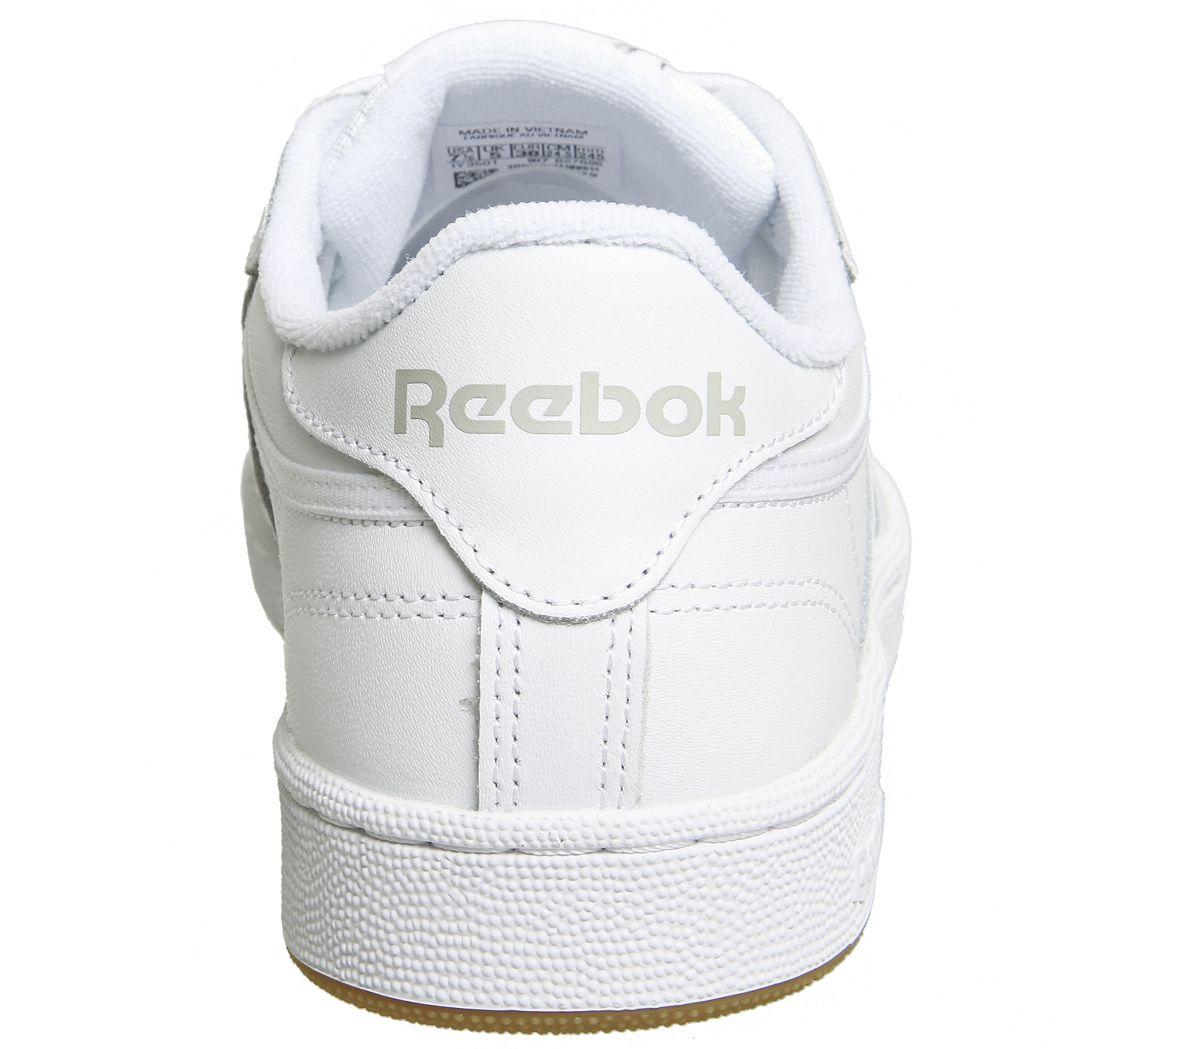 Haut-femme-Reebok-Club-C-85-Baskets-Gris-Blanc-Gomme-Baskets-Chaussures miniature 10